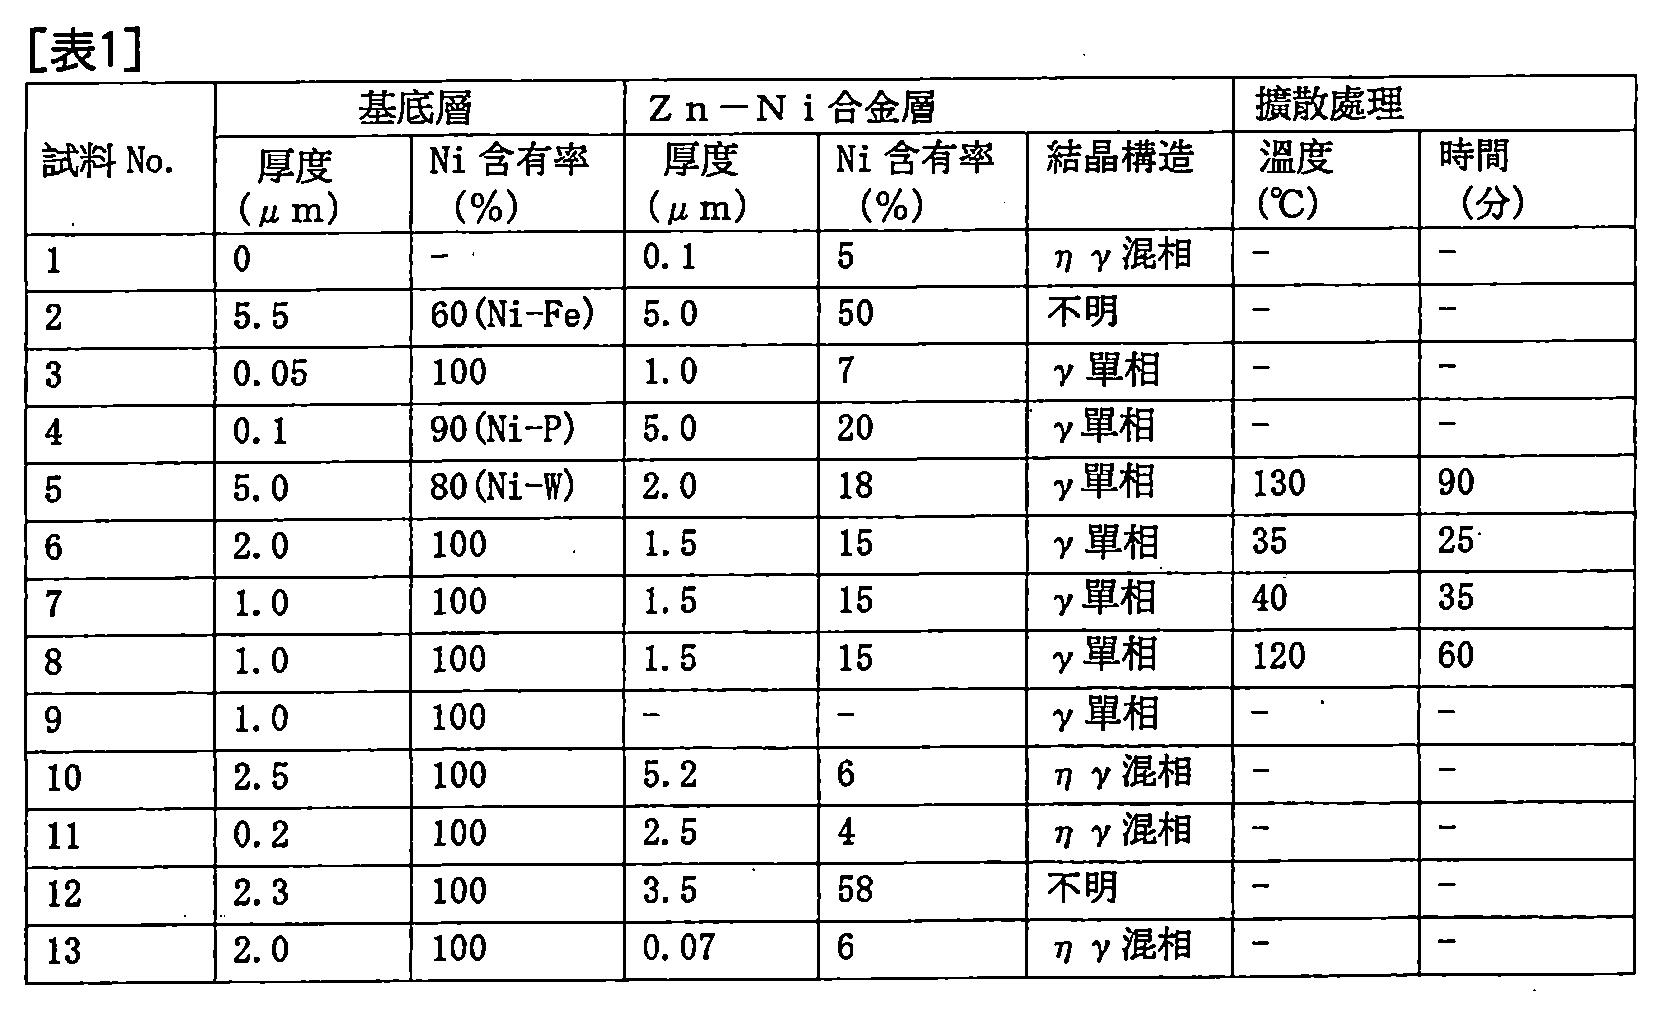 Figure 105141632-A0202-12-0016-1